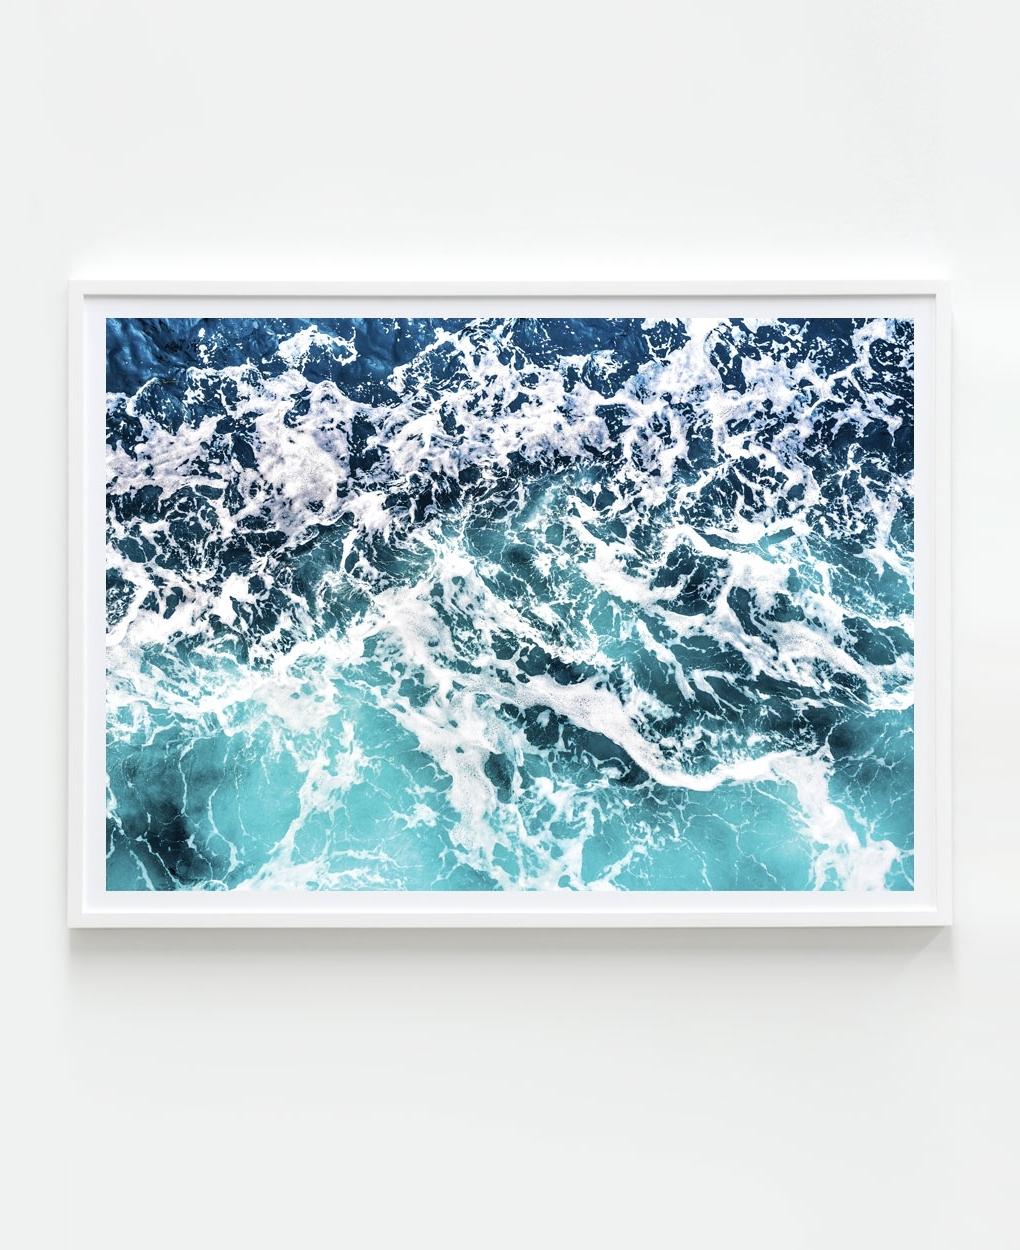 39 Ocean Wall Art, Orca Killer Whale Sea Ocean Wall Art Mural Decor Inside Most Up To Date Ocean Wall Art (View 3 of 15)